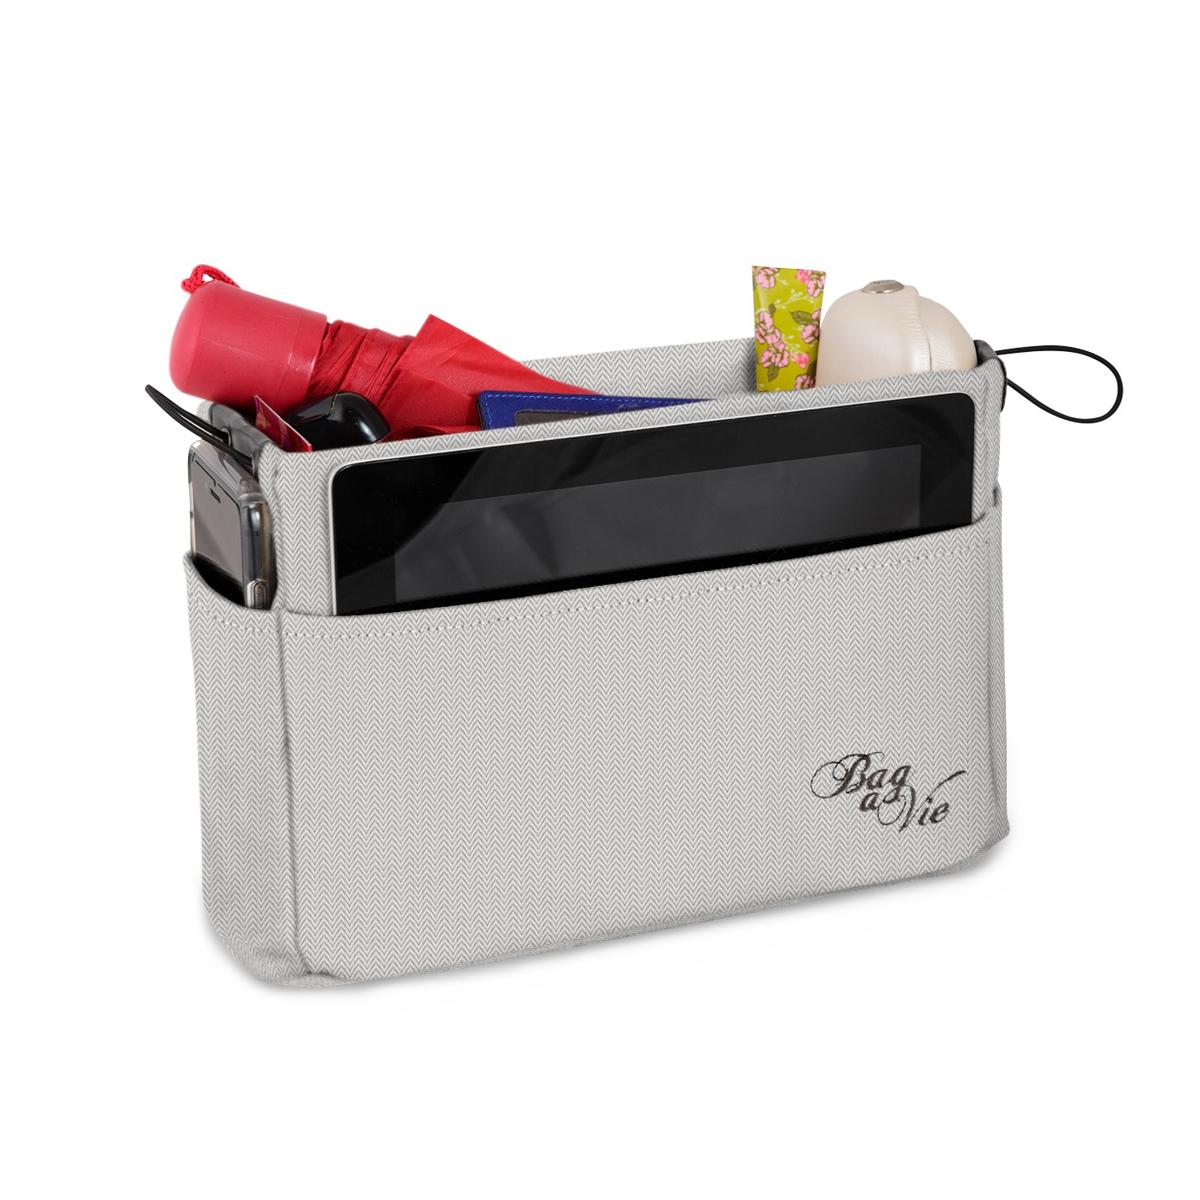 Deluxe Handbag Organizers